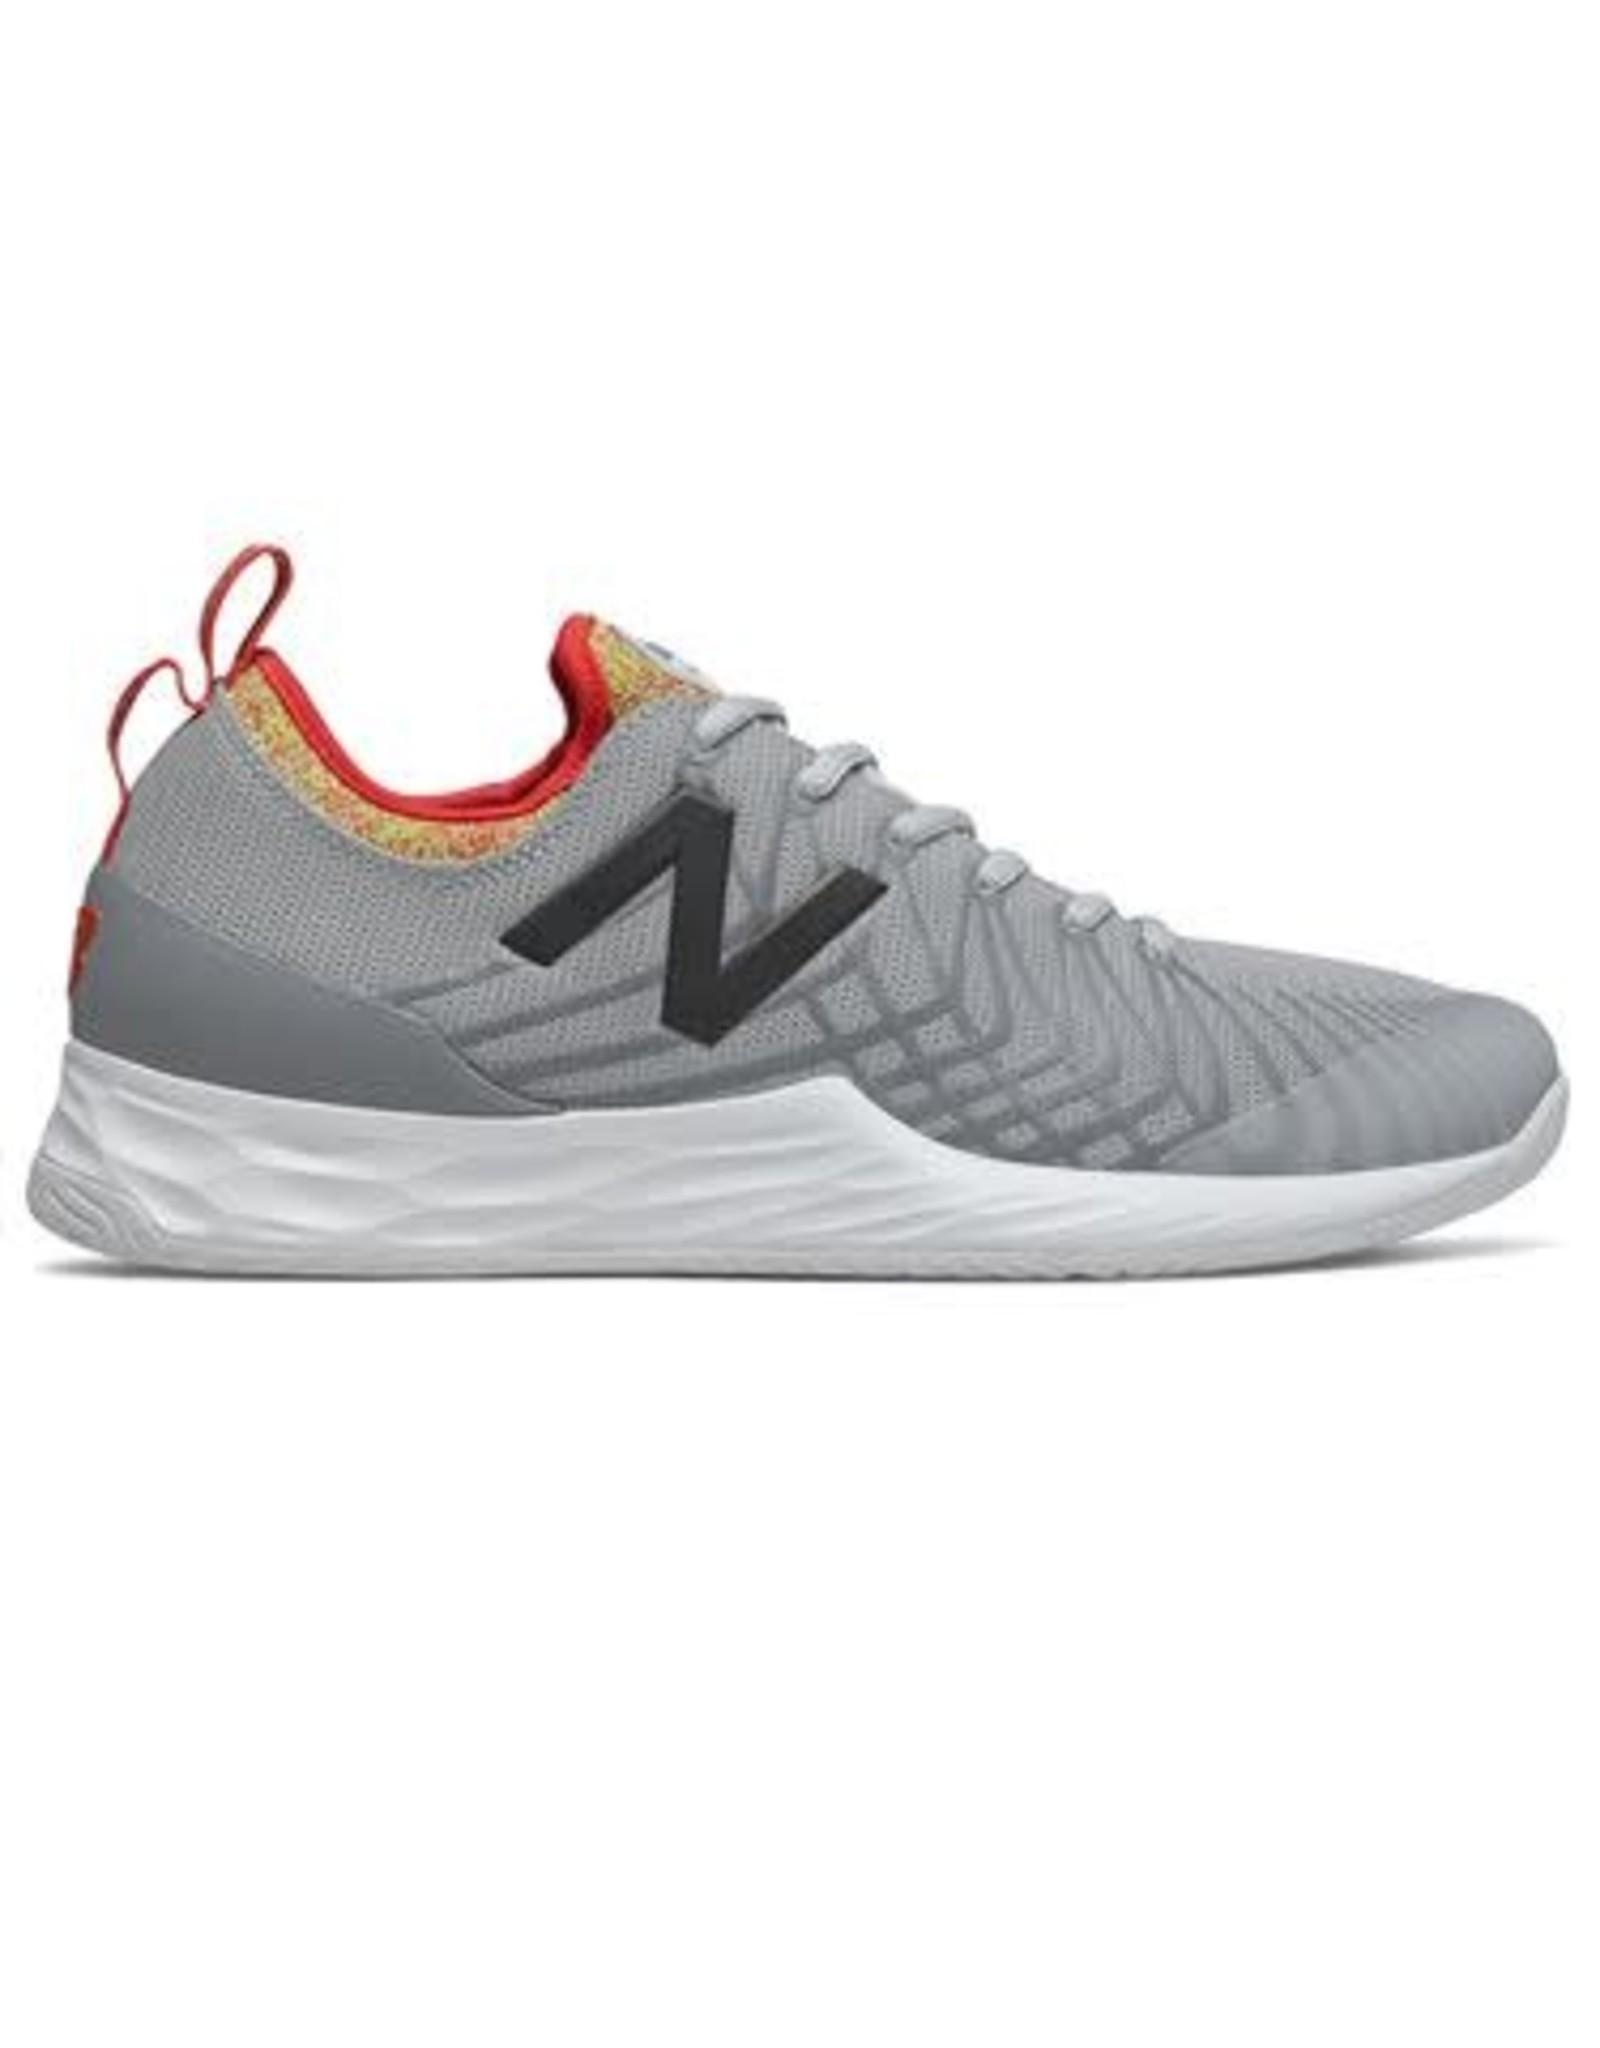 New Balance New Balance MCHLAVGM Men's Tennis Shoe